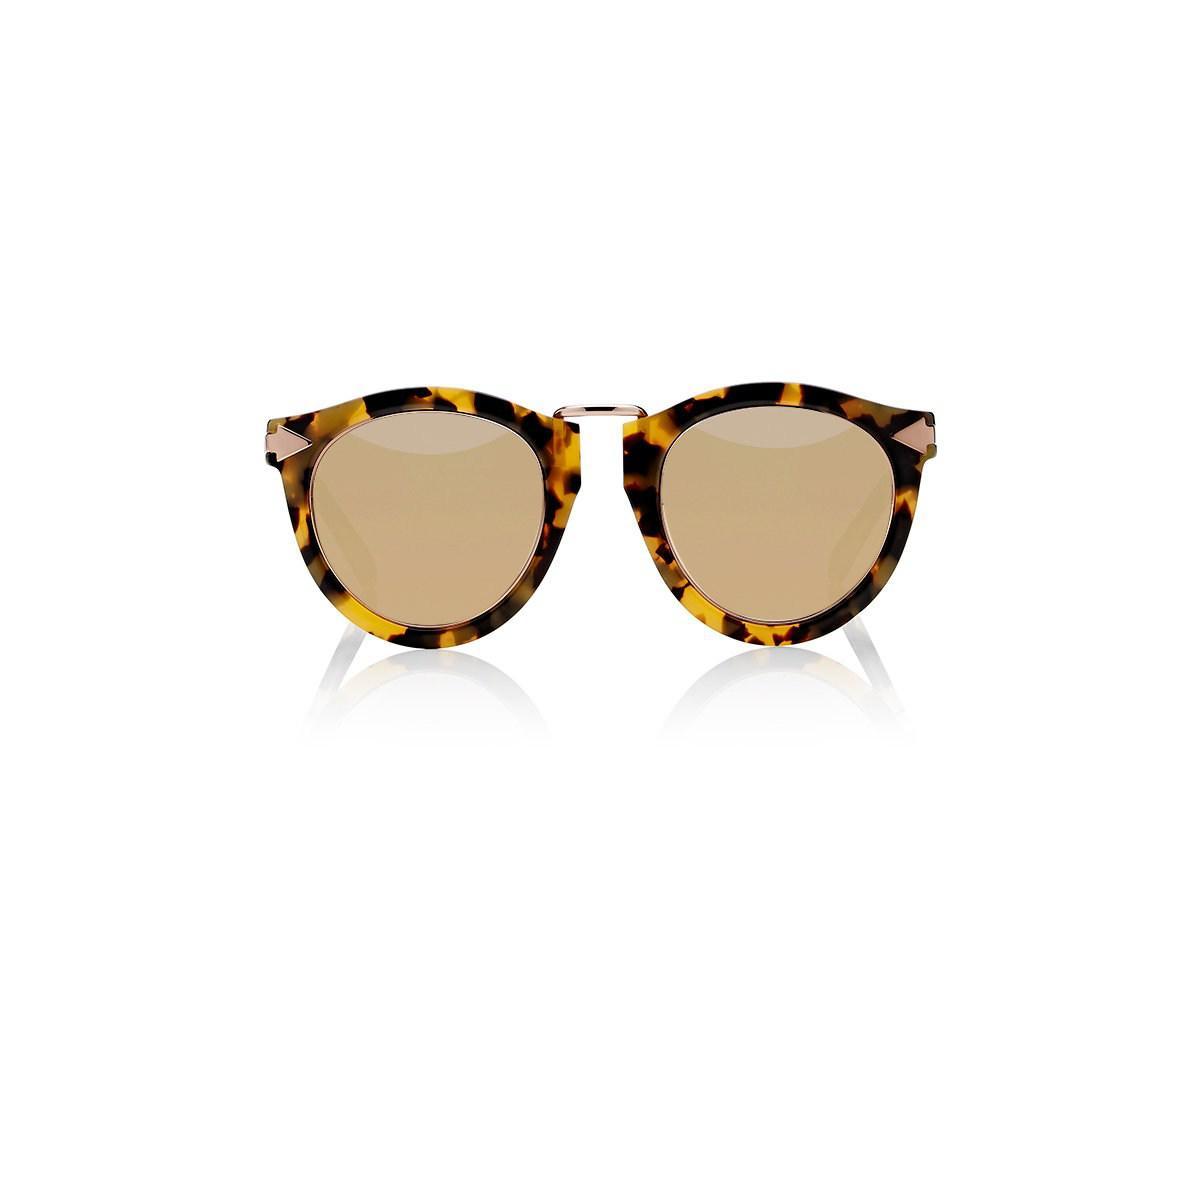 31516159f21 Lyst - Karen Walker Harvest Superstars Sunglasses in Brown